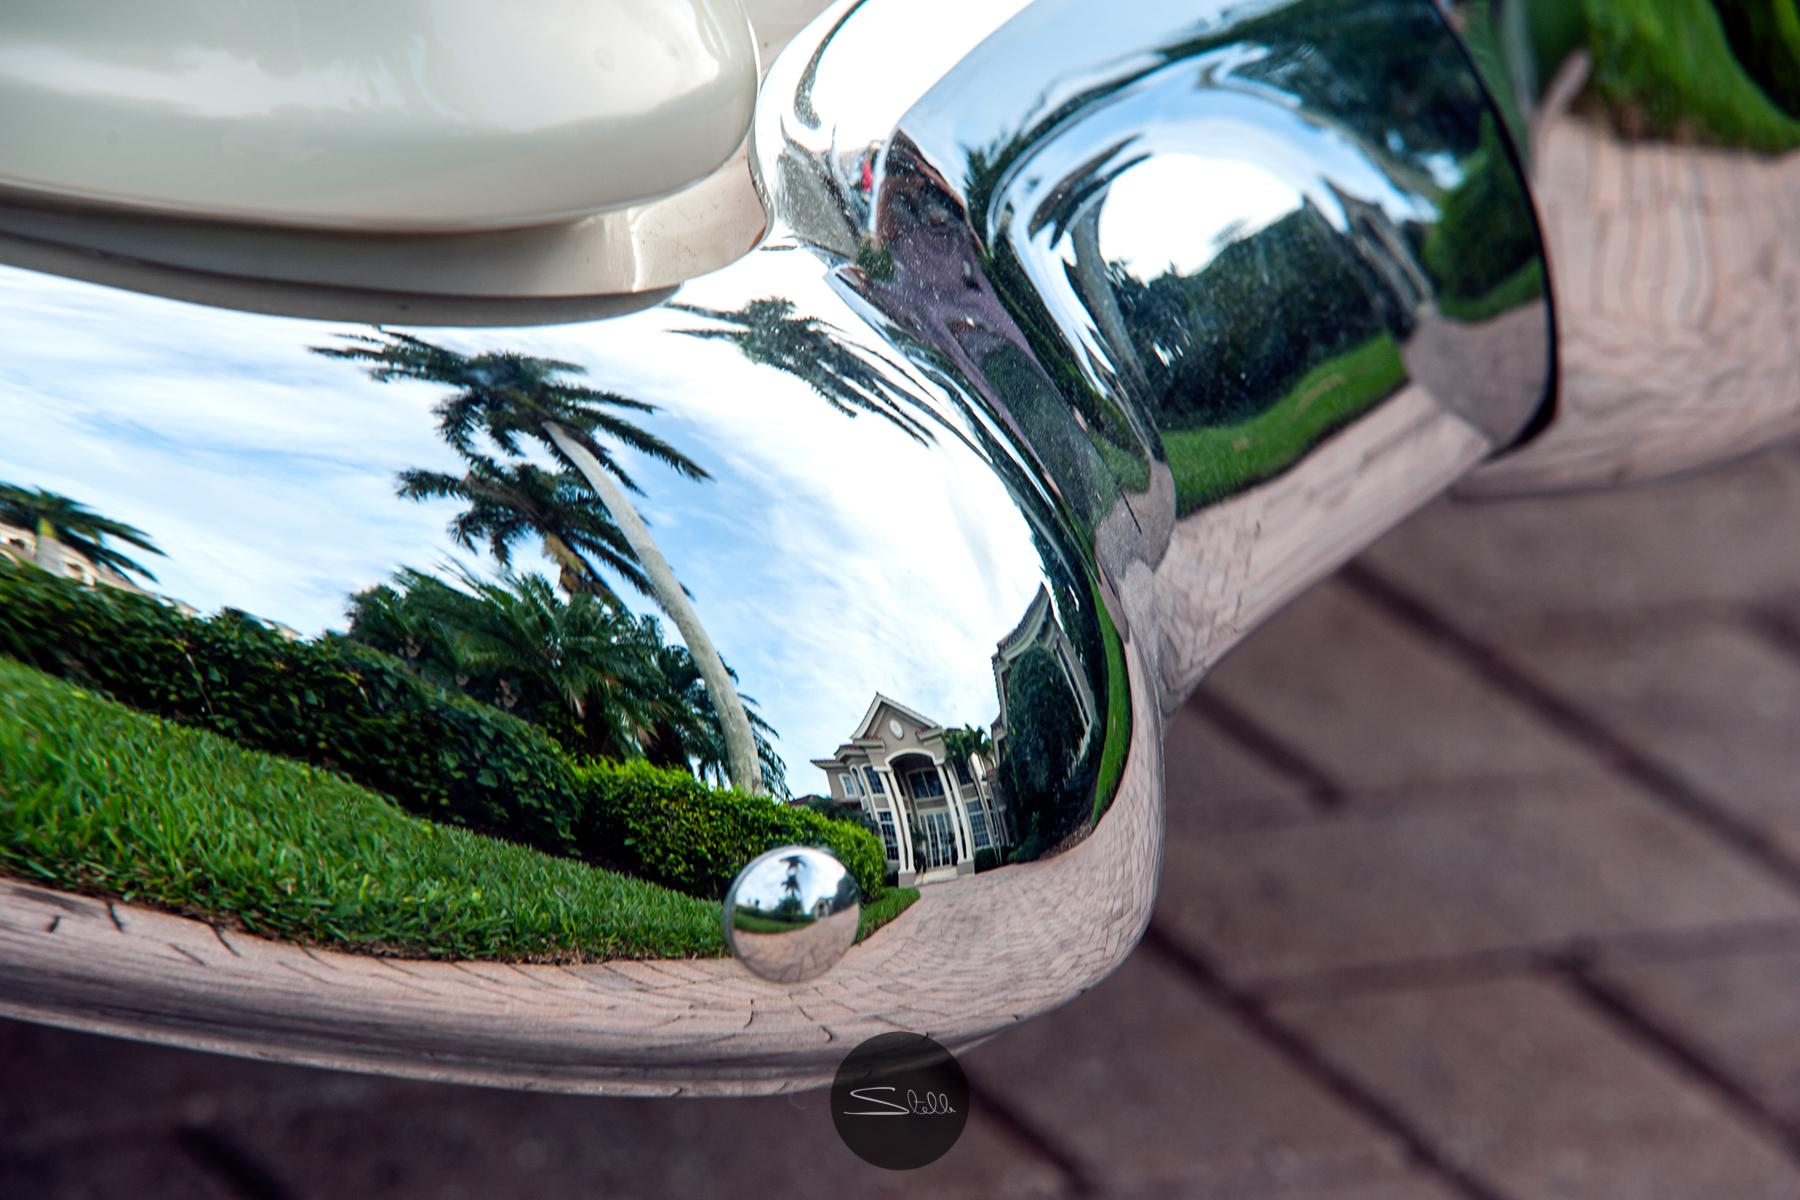 Stella Scordellis Chevrolet Reflection Watermarked.jpg